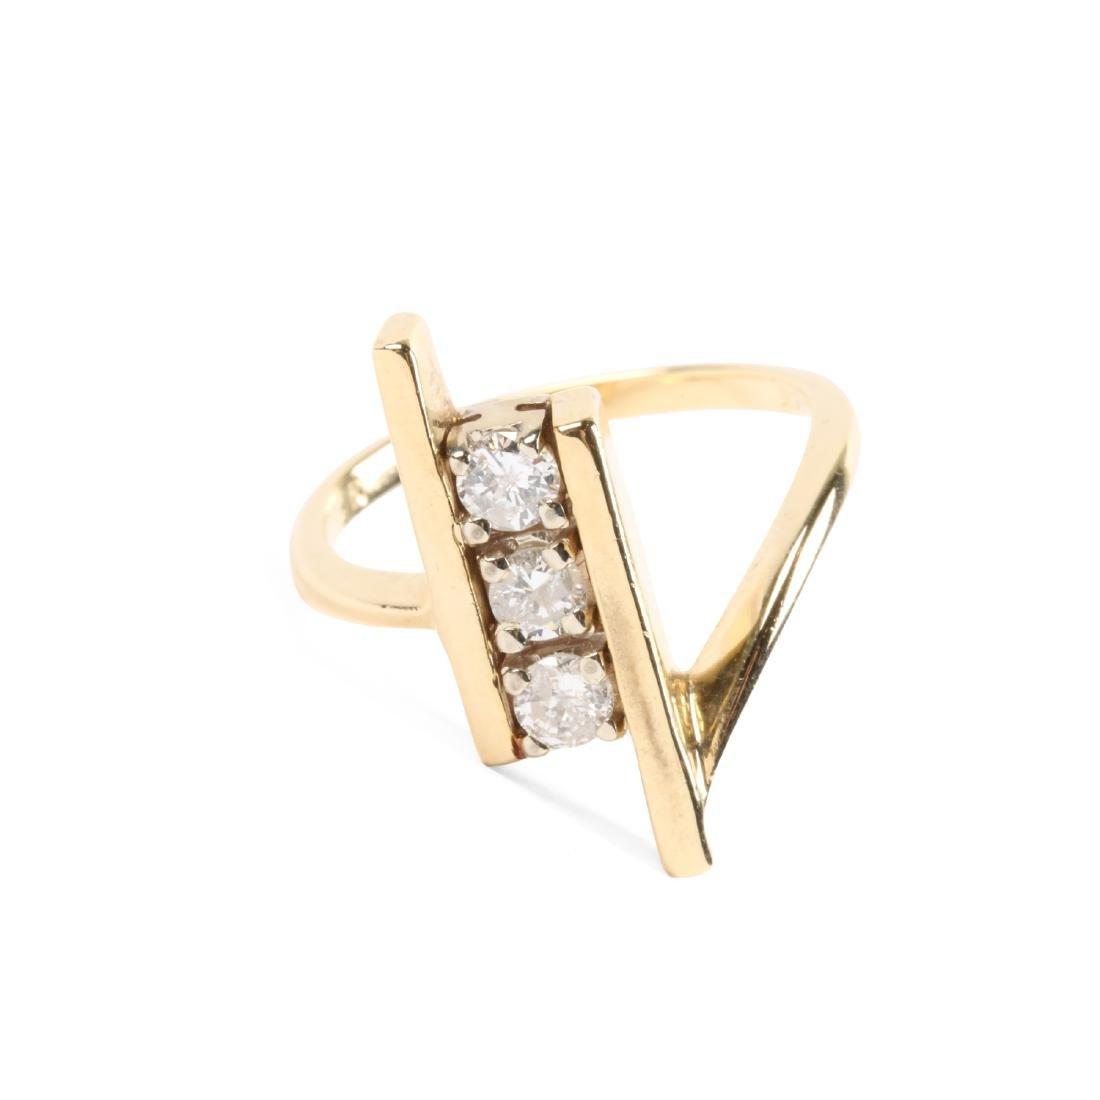 A 14K Gold & Diamond Ring